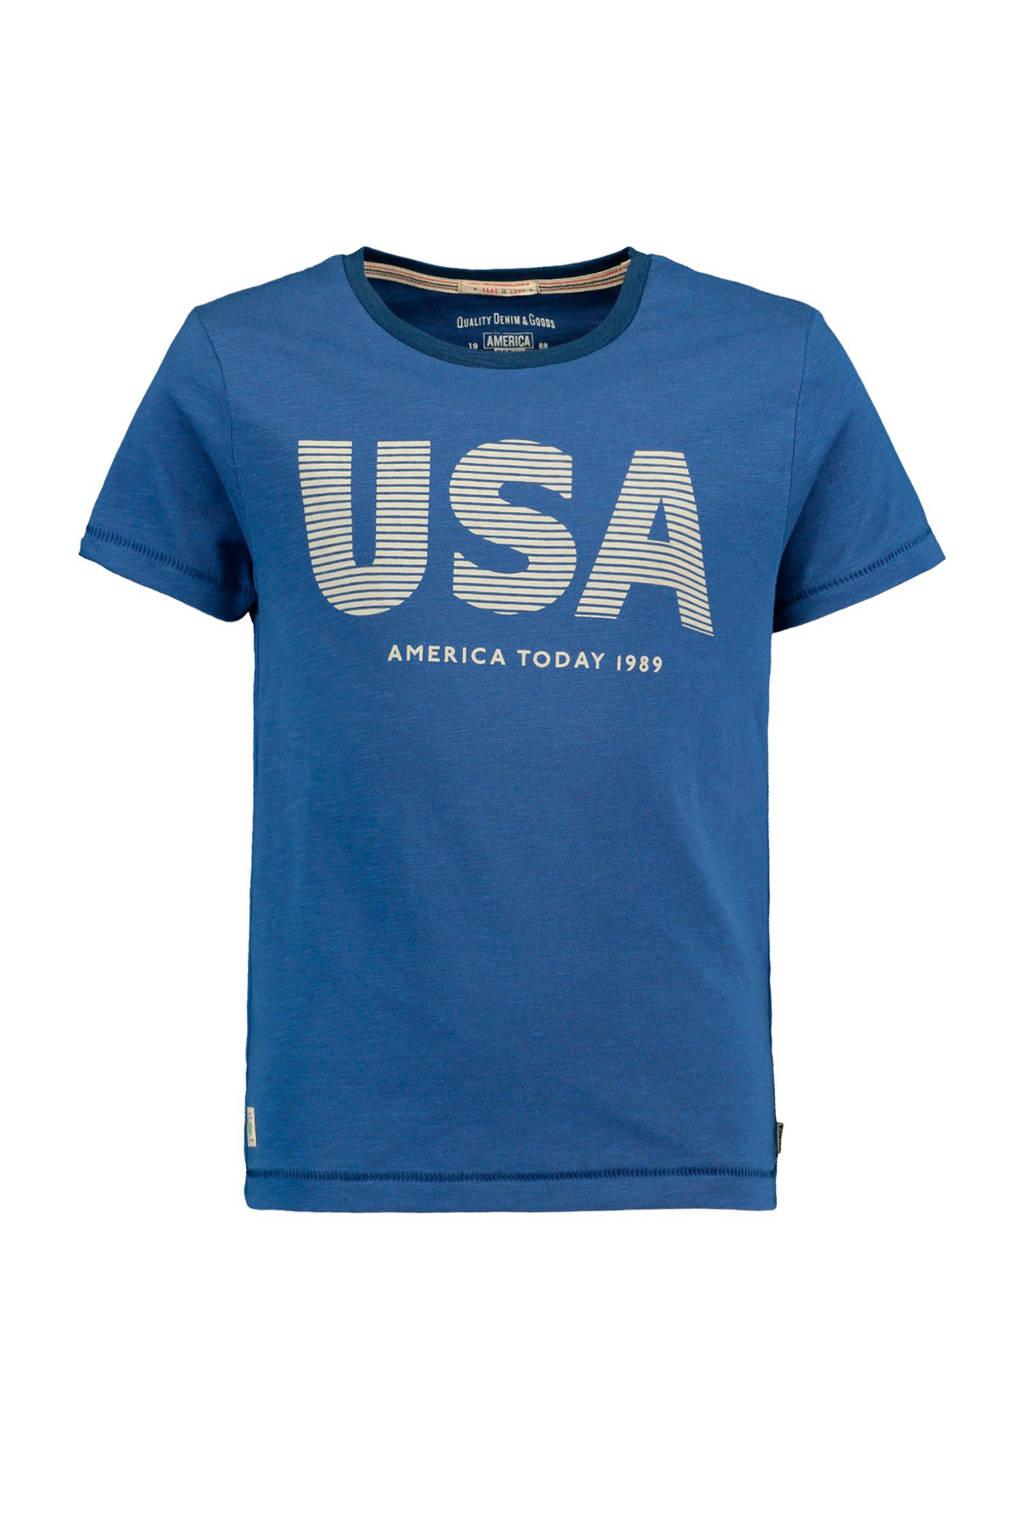 America Today Junior T-shirt Eric met tekst blauw, Blauw